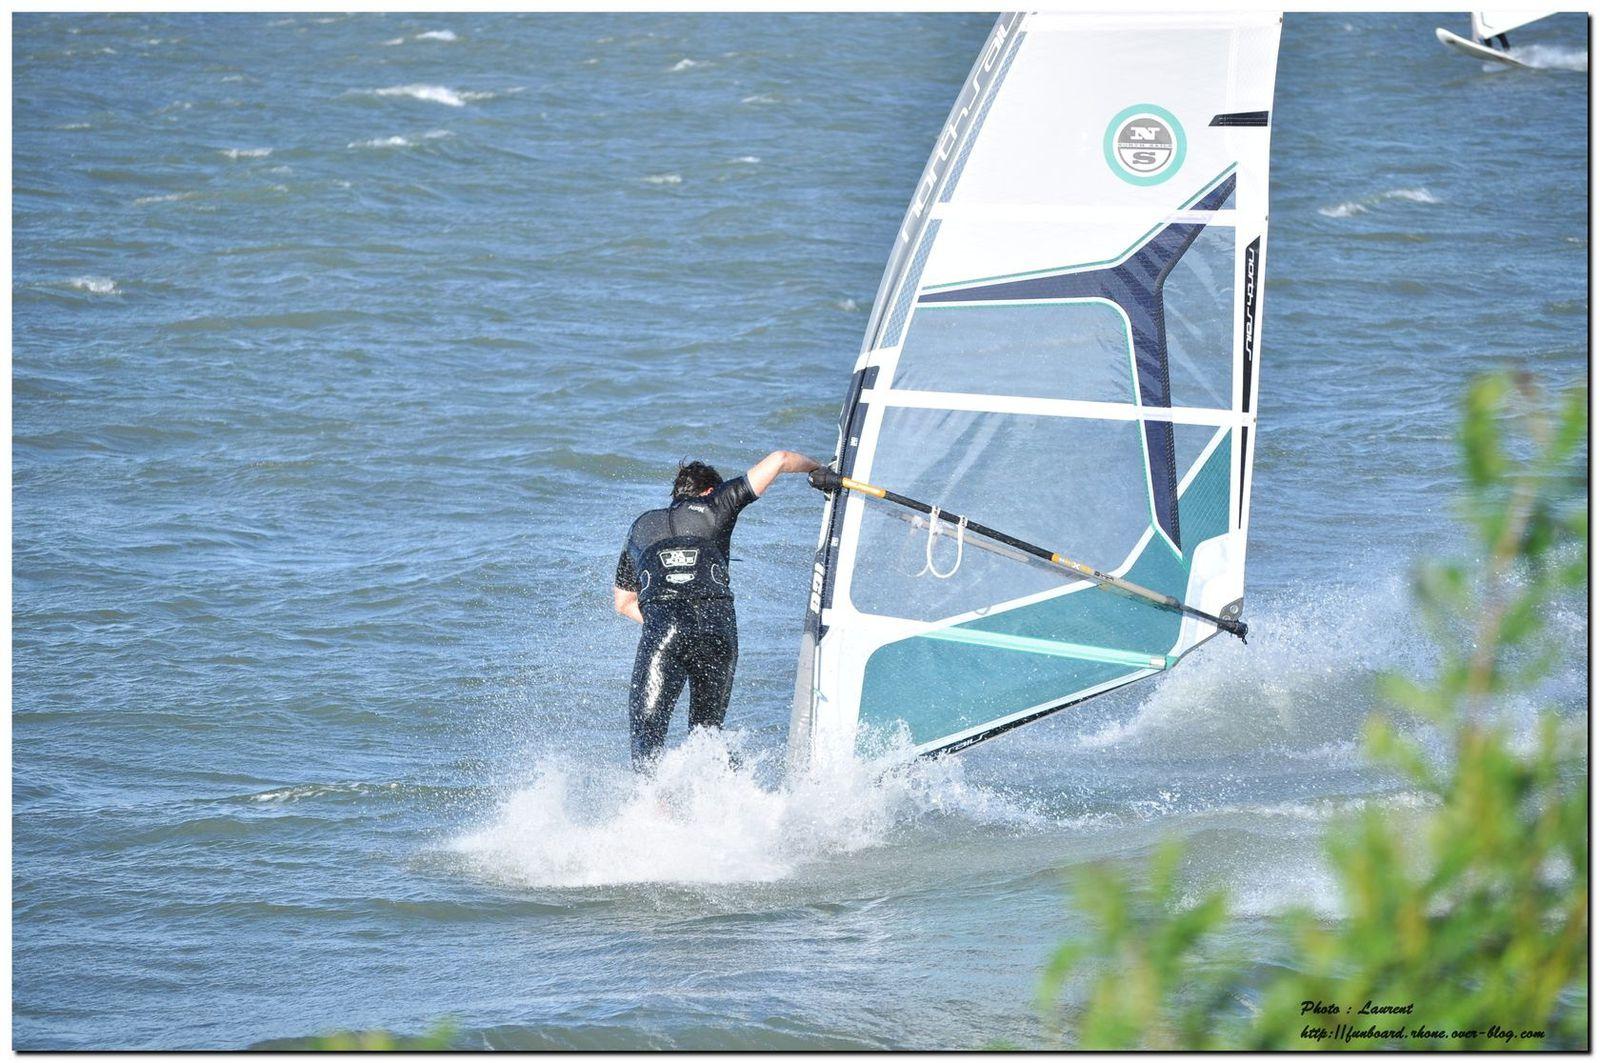 Troc windsurf